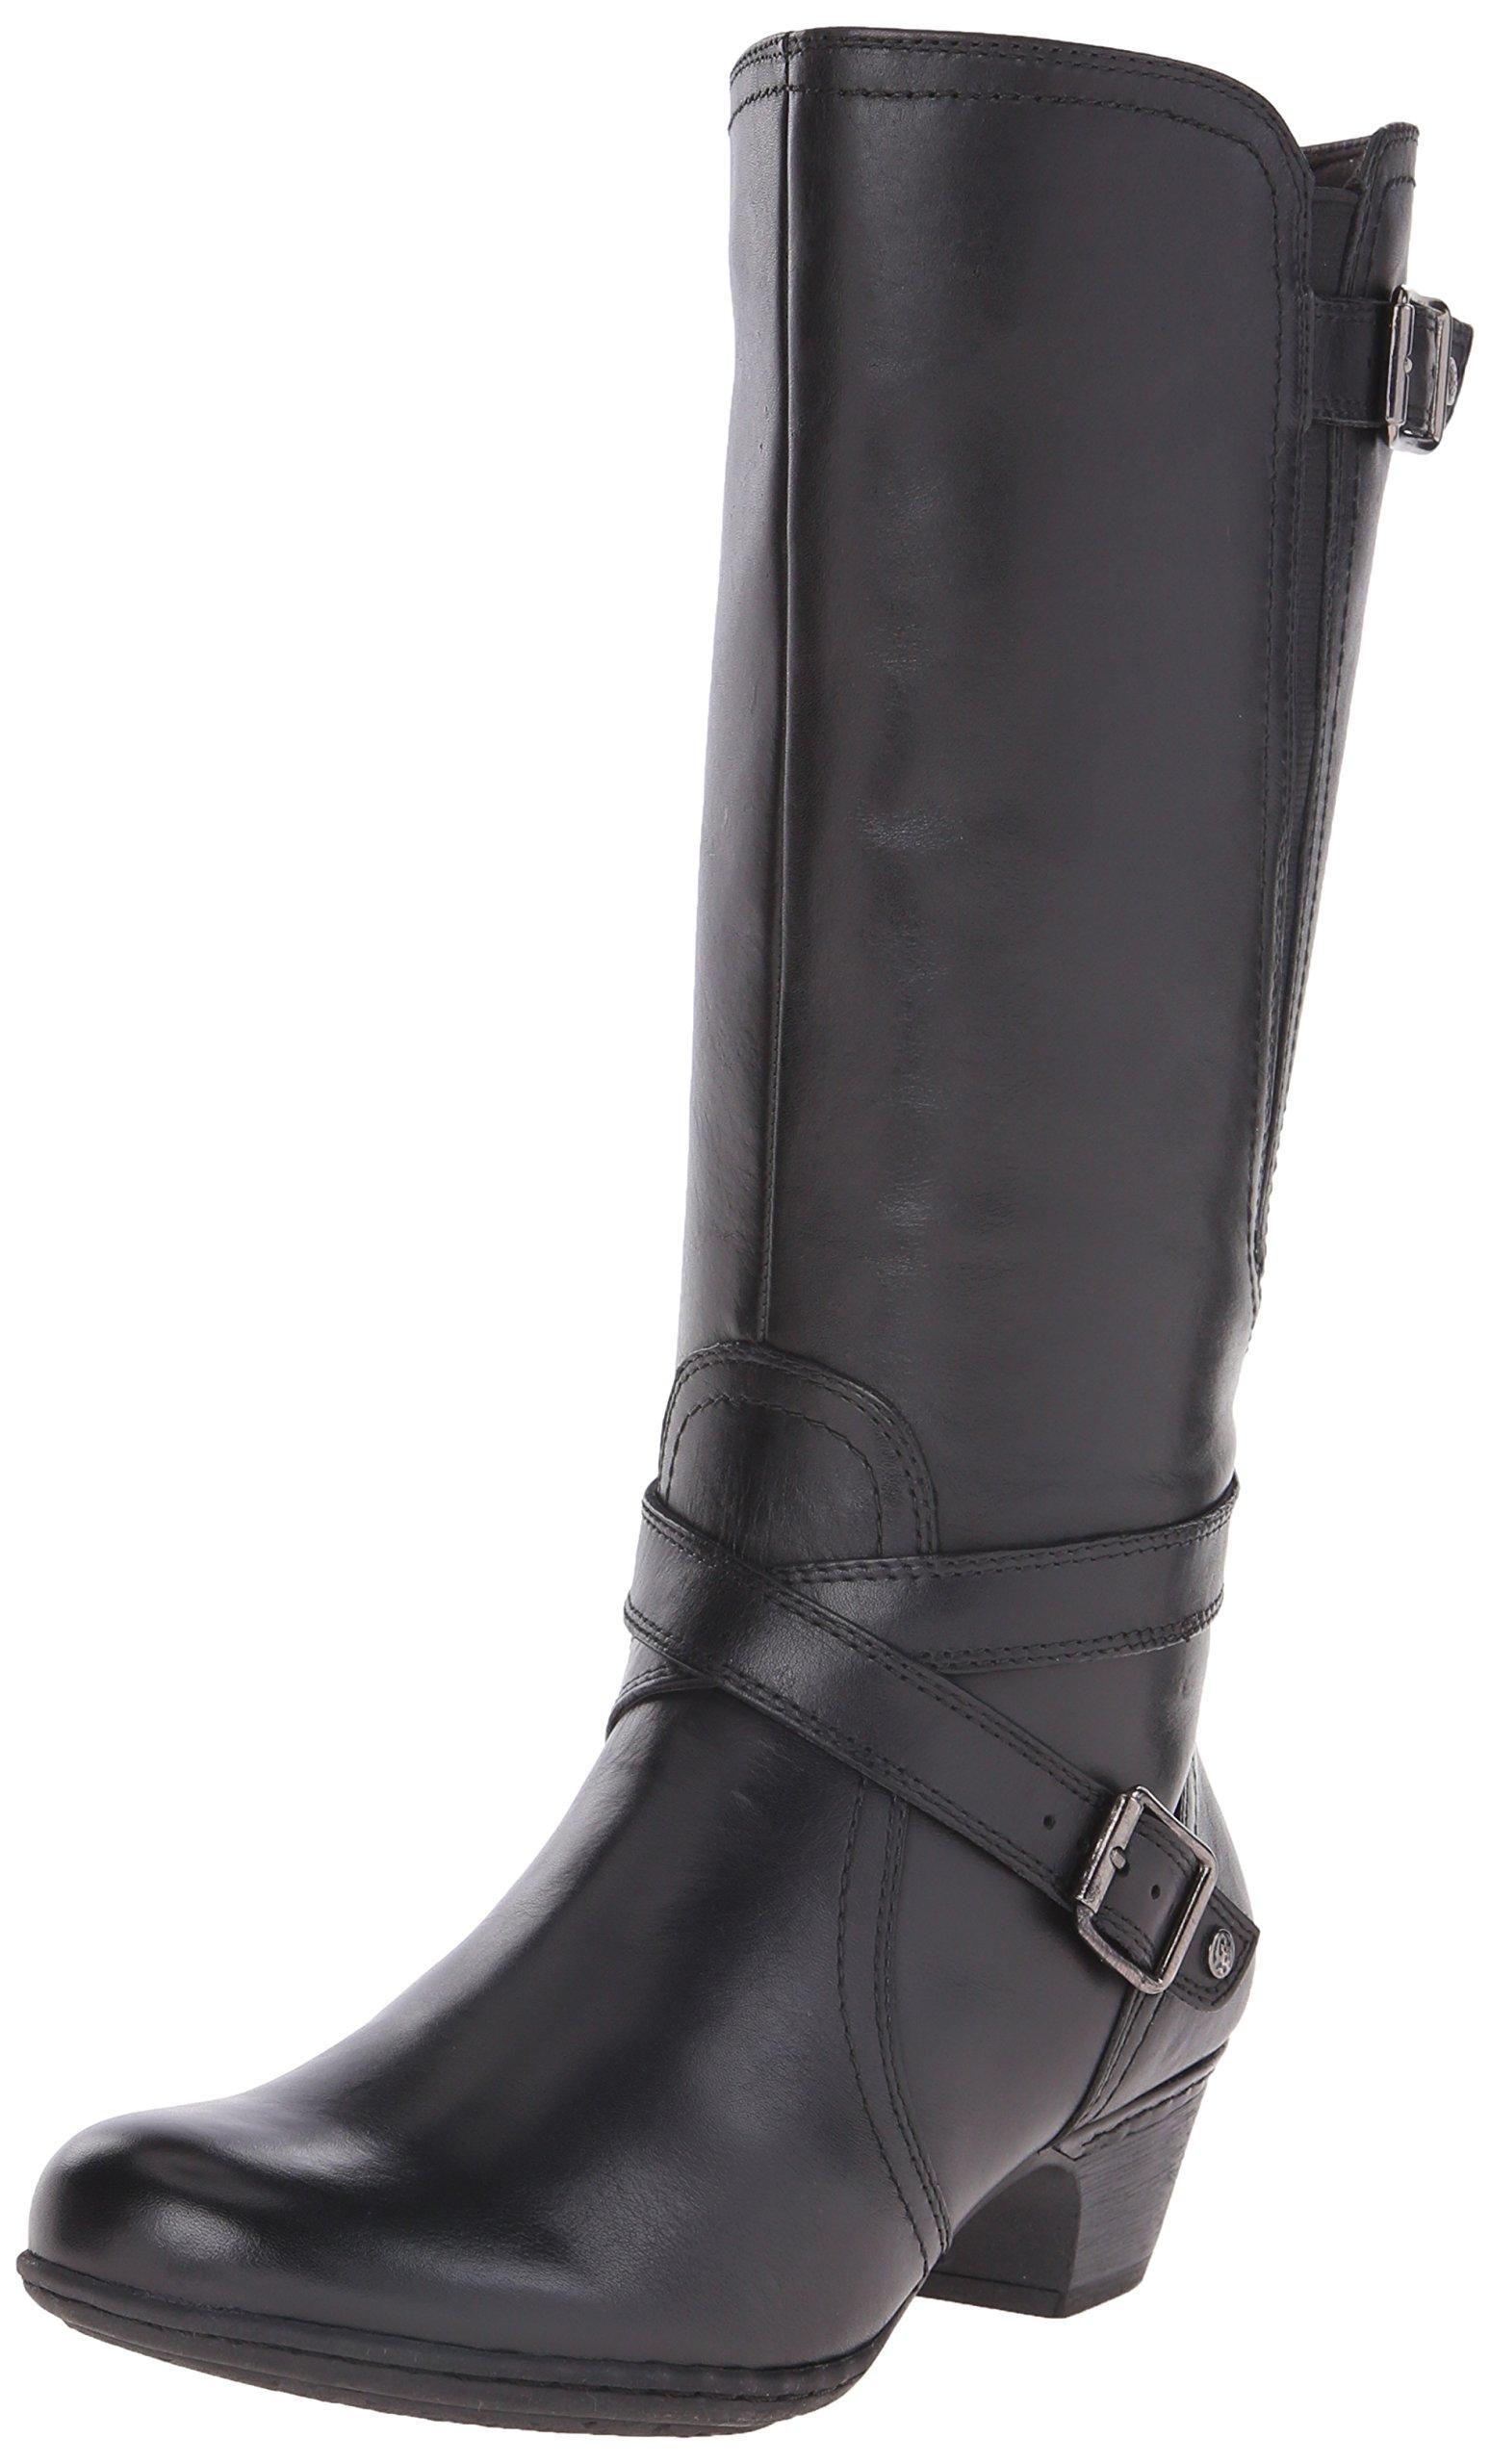 Cobb Hill Rockport Women's Ashlyn Boot, Black, 10 W US